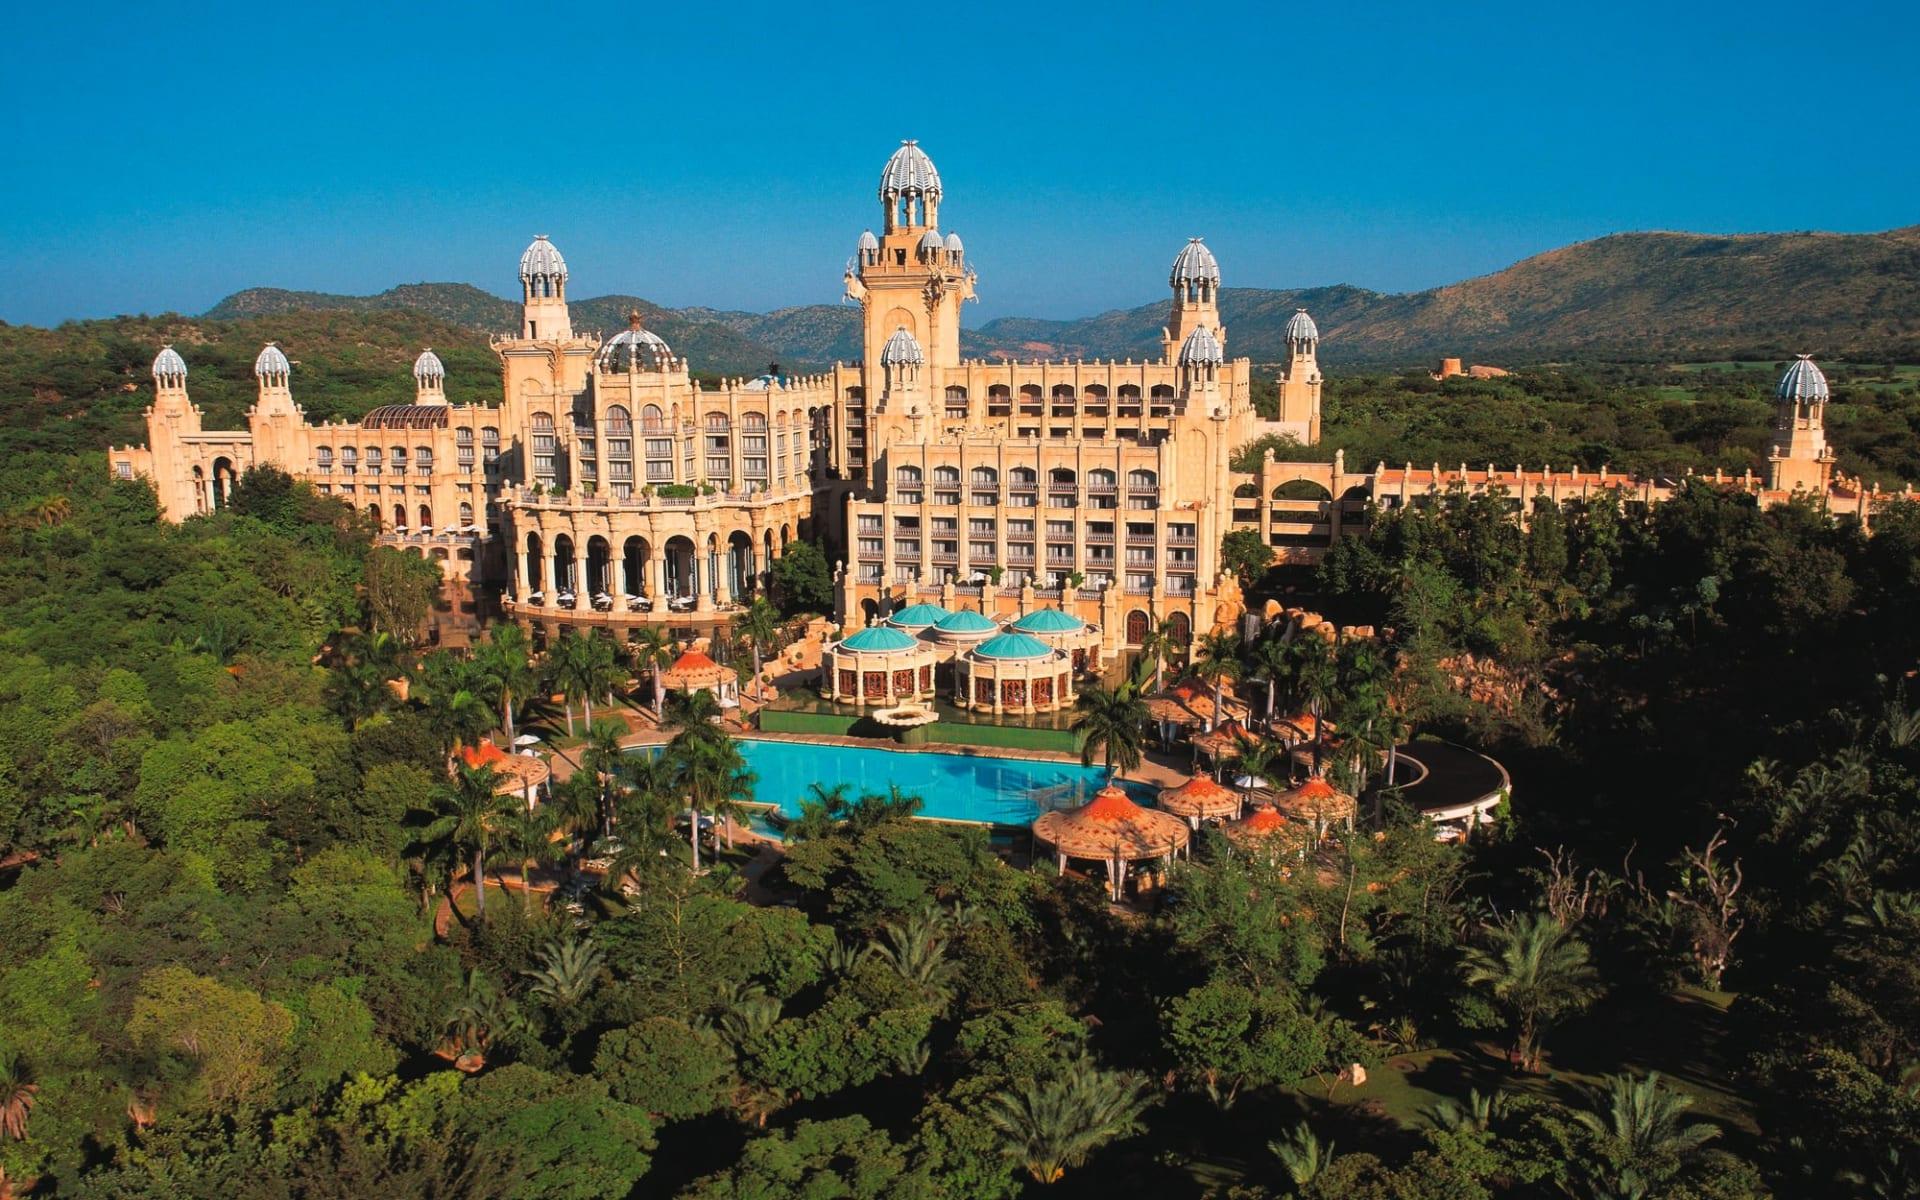 Sun City The Palace of the Lost City: Sun City Resort - Aussenansicht Hotelanlage